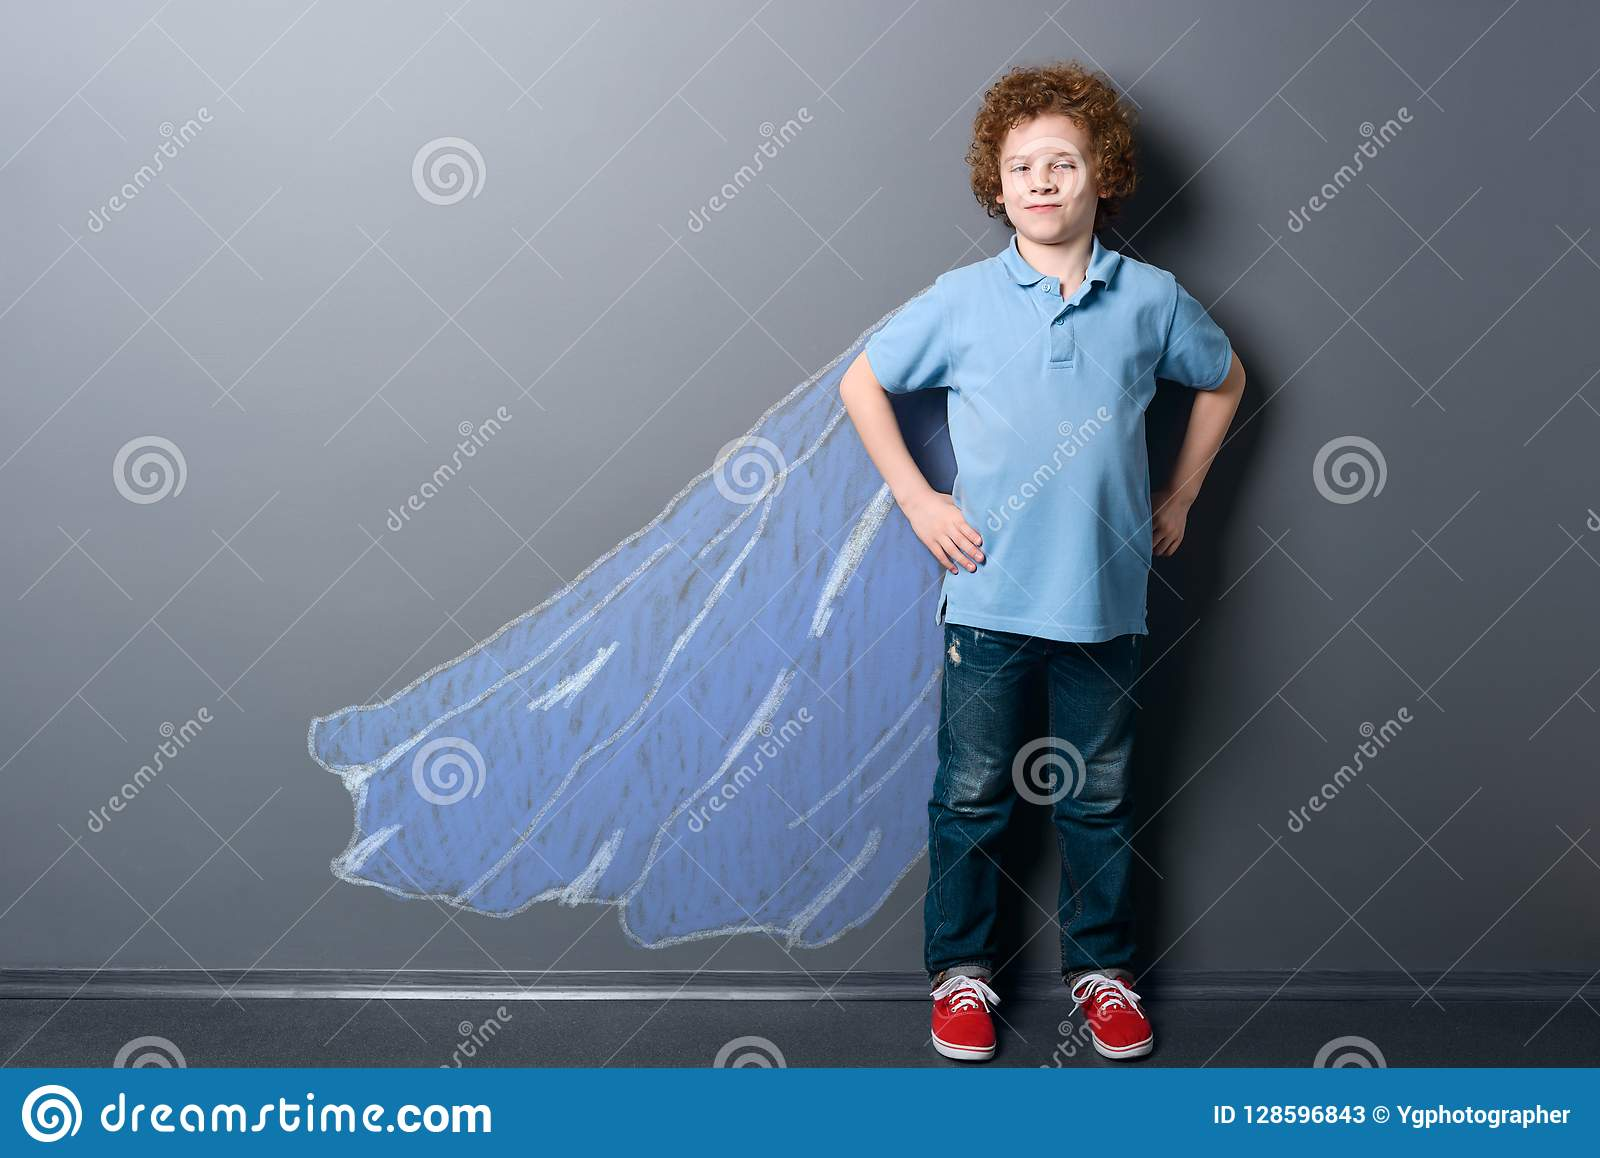 Chłopiec jako super bohater